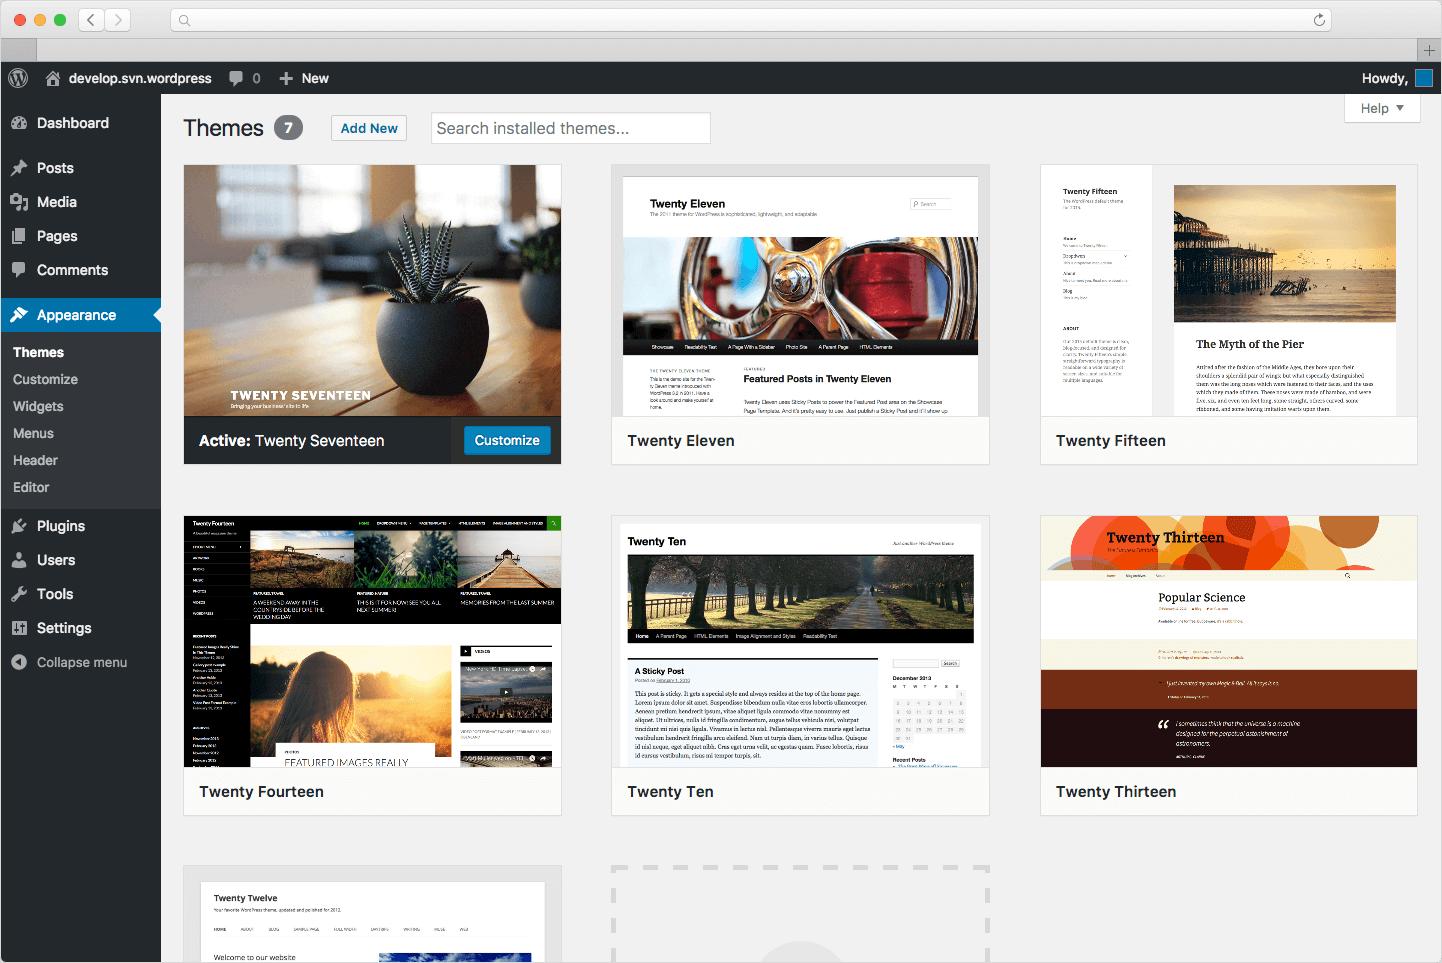 WordPress - Open Source Software